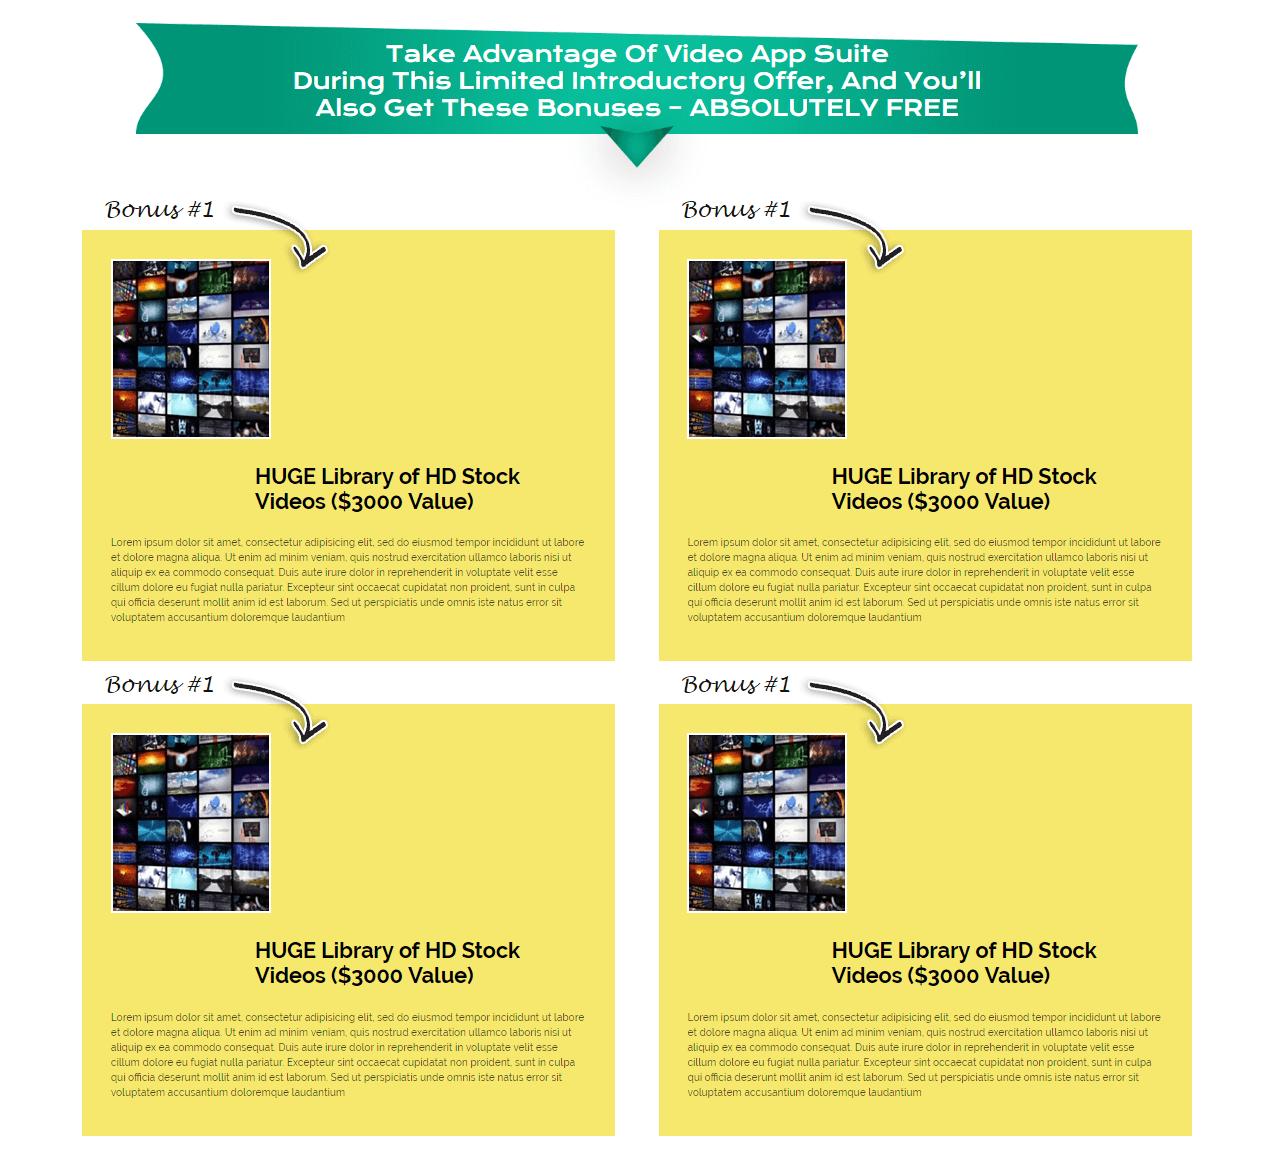 Video-App-Suite-Bonuses